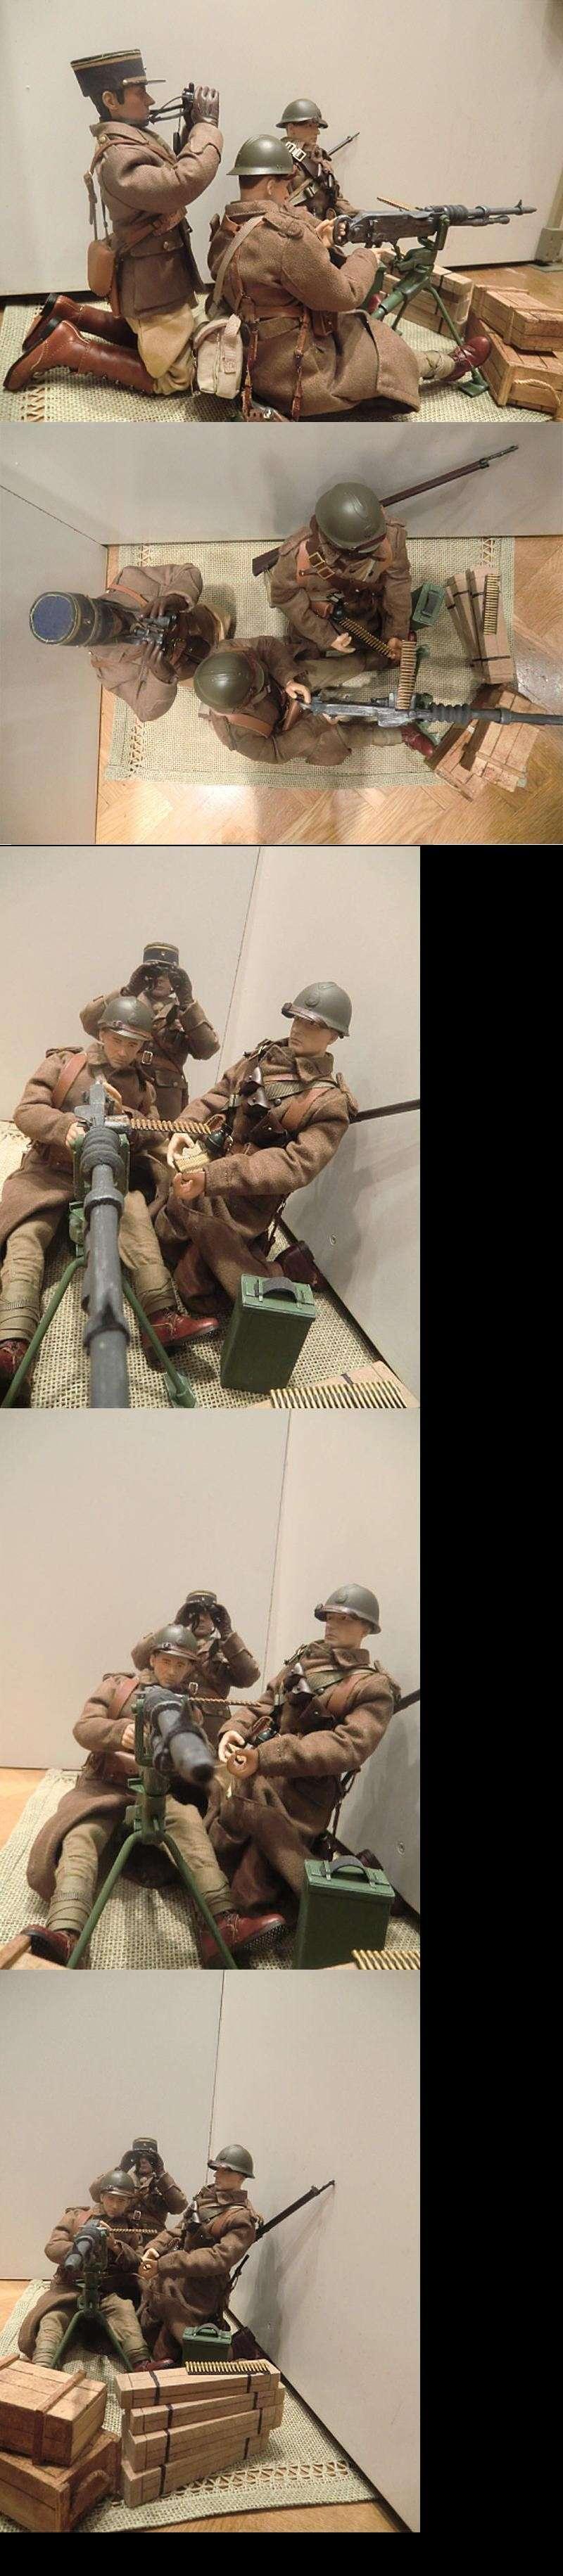 mitrailleuse Hotchkiss  Cimg4411